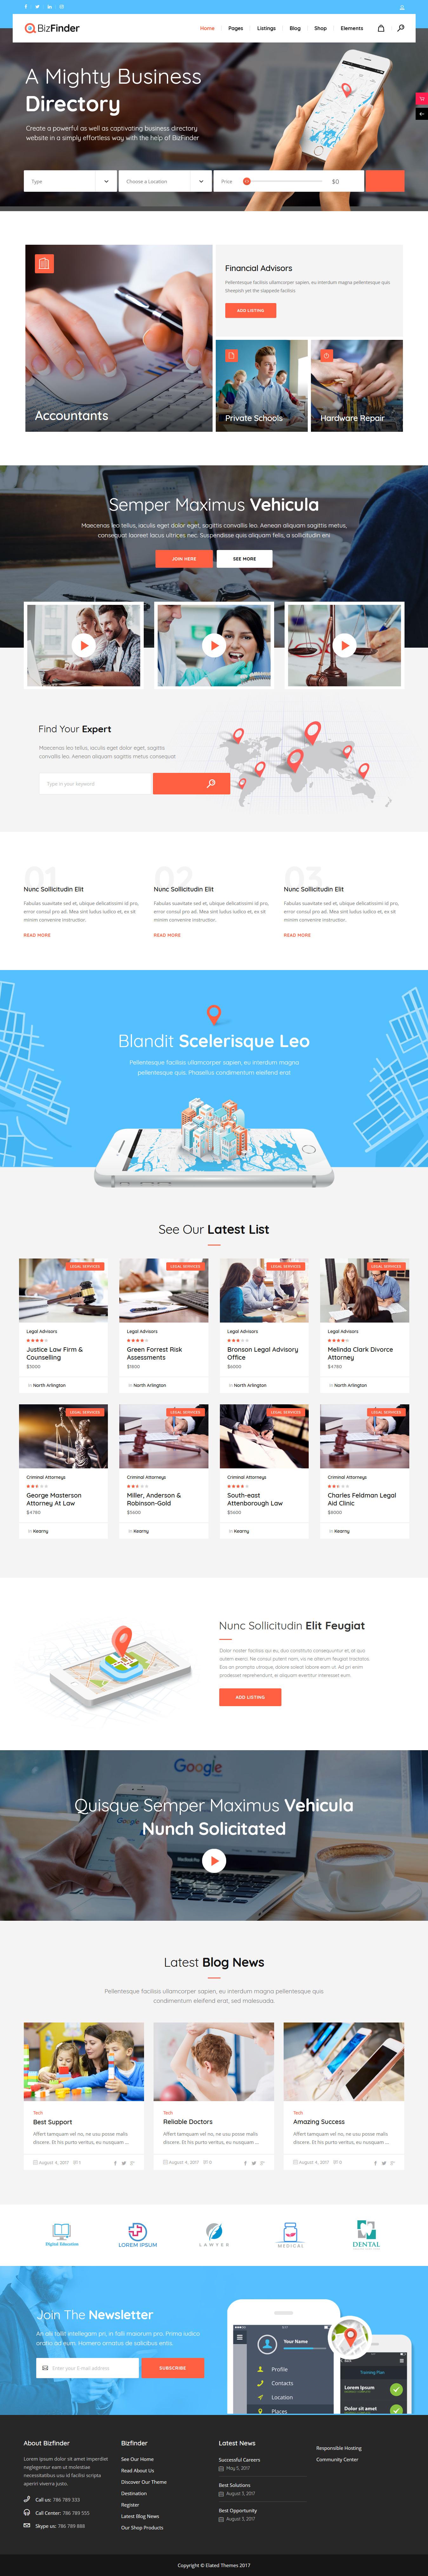 bizfinder best premium classified wordpress theme - 10+ Best Premium Classified WordPress Themes